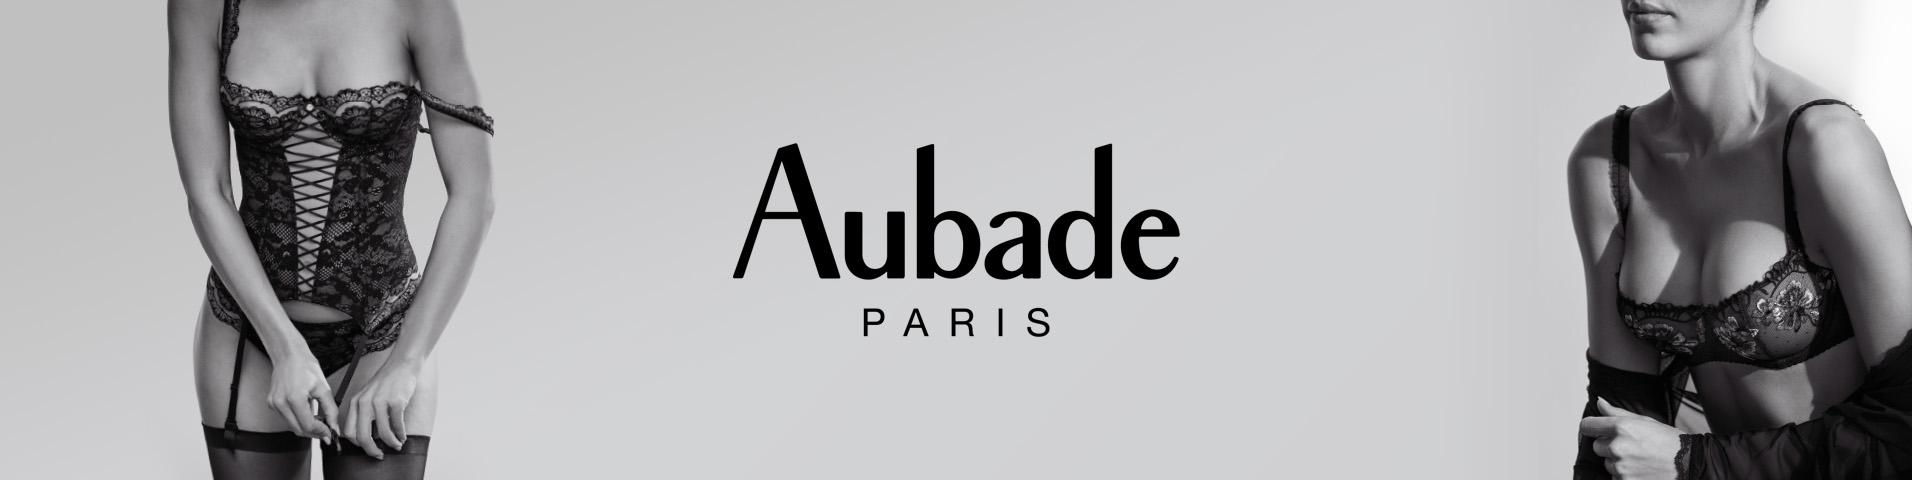 495c5686e6e2 SALE! Jetzt die besten Aubade Sale Angebote shoppen